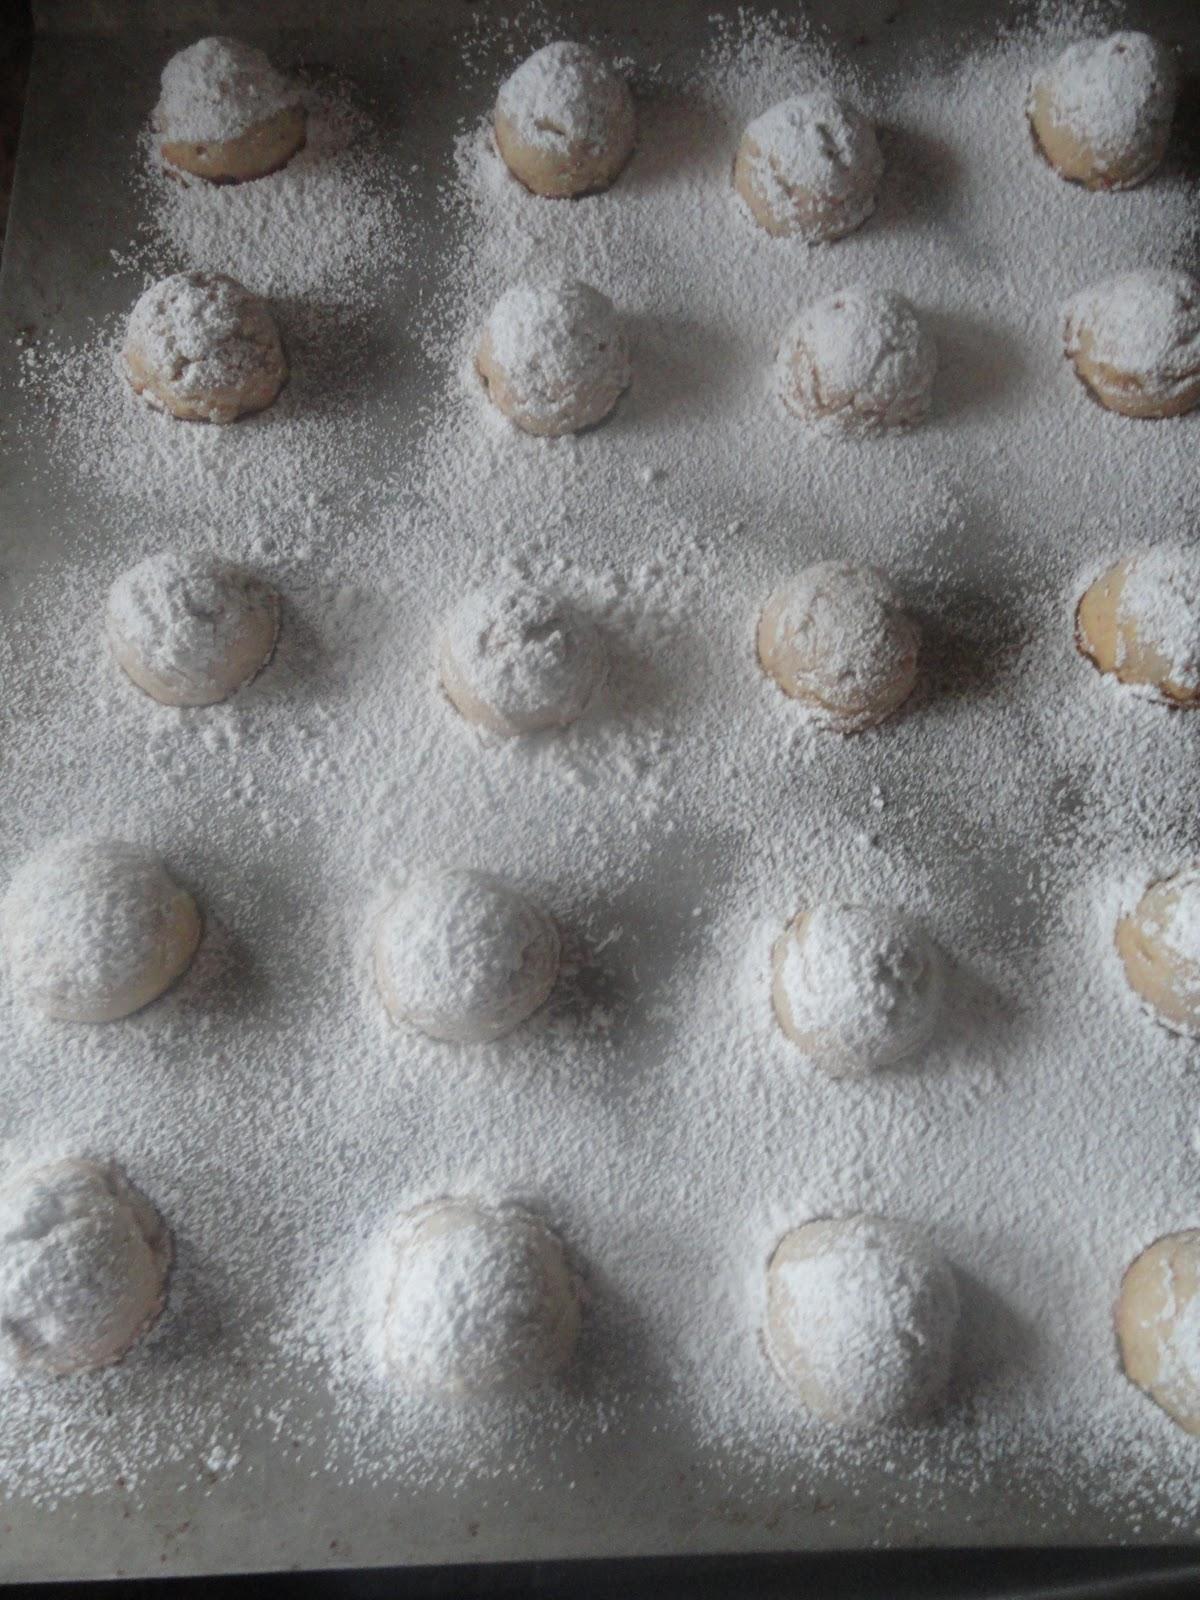 Russian-Tea-Cakes-Or-Mexican-Wedding-Cakes-Coat-Powdered-Sugar.jpg